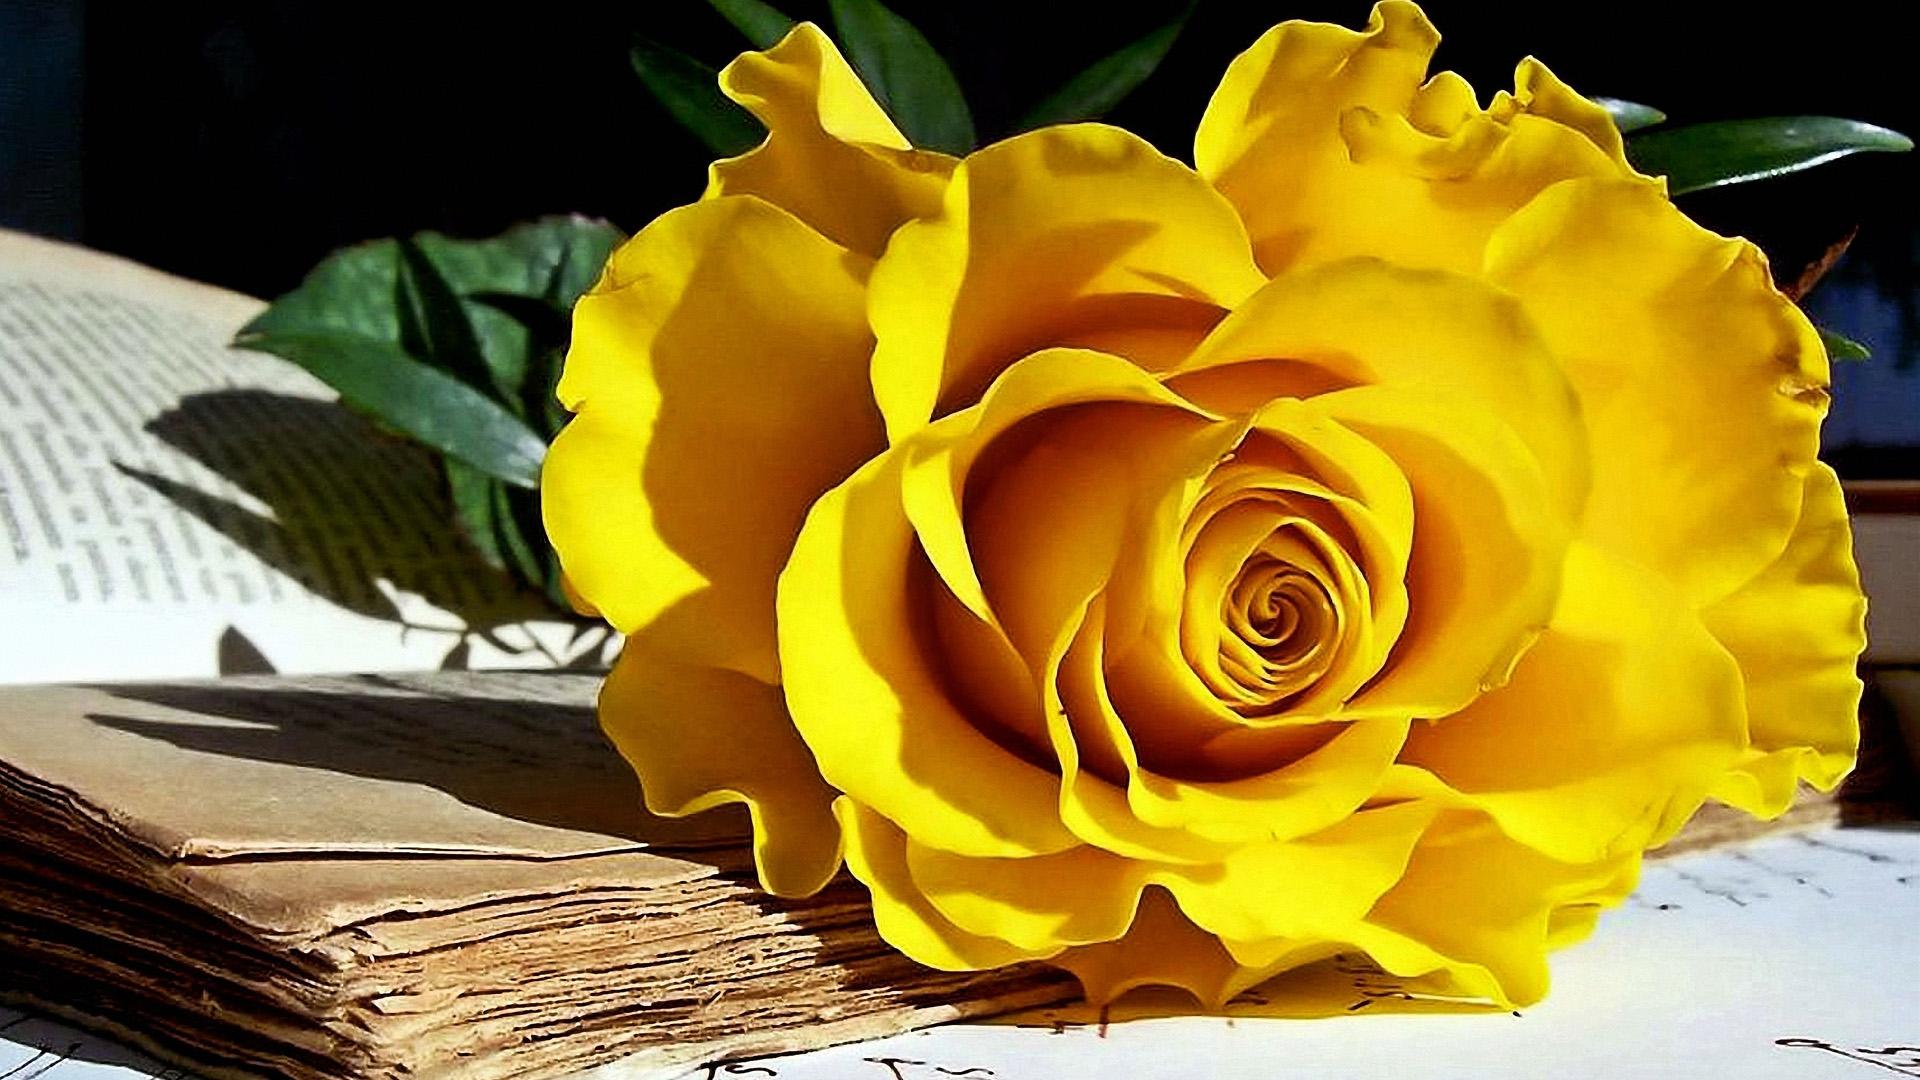 Yellow Rose Wallpaper 1920x1080